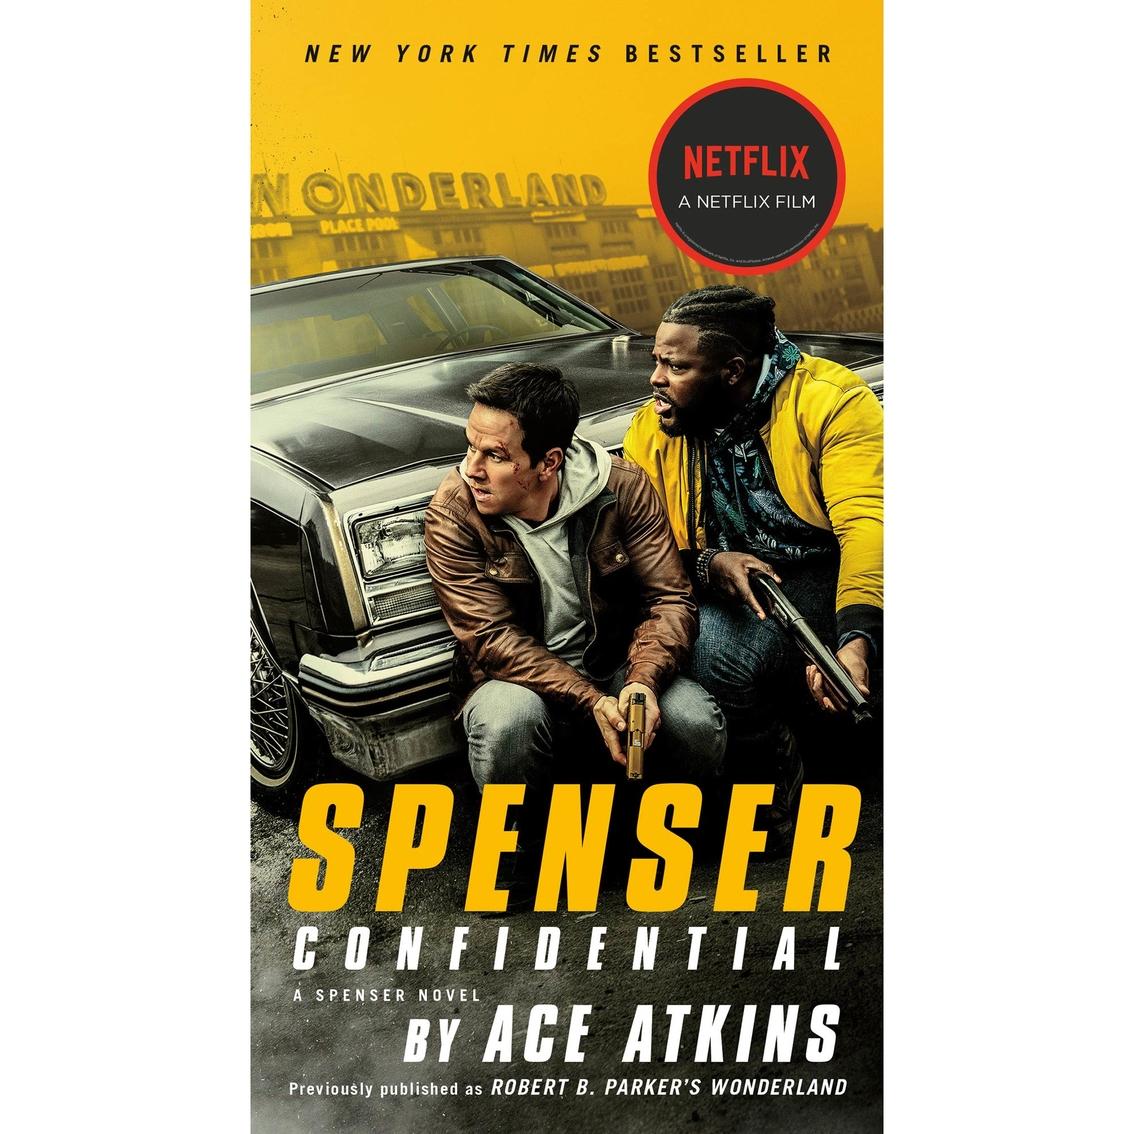 Spenser Confidential Movie Tie In Fiction Literature Home Office School Shop The Exchange